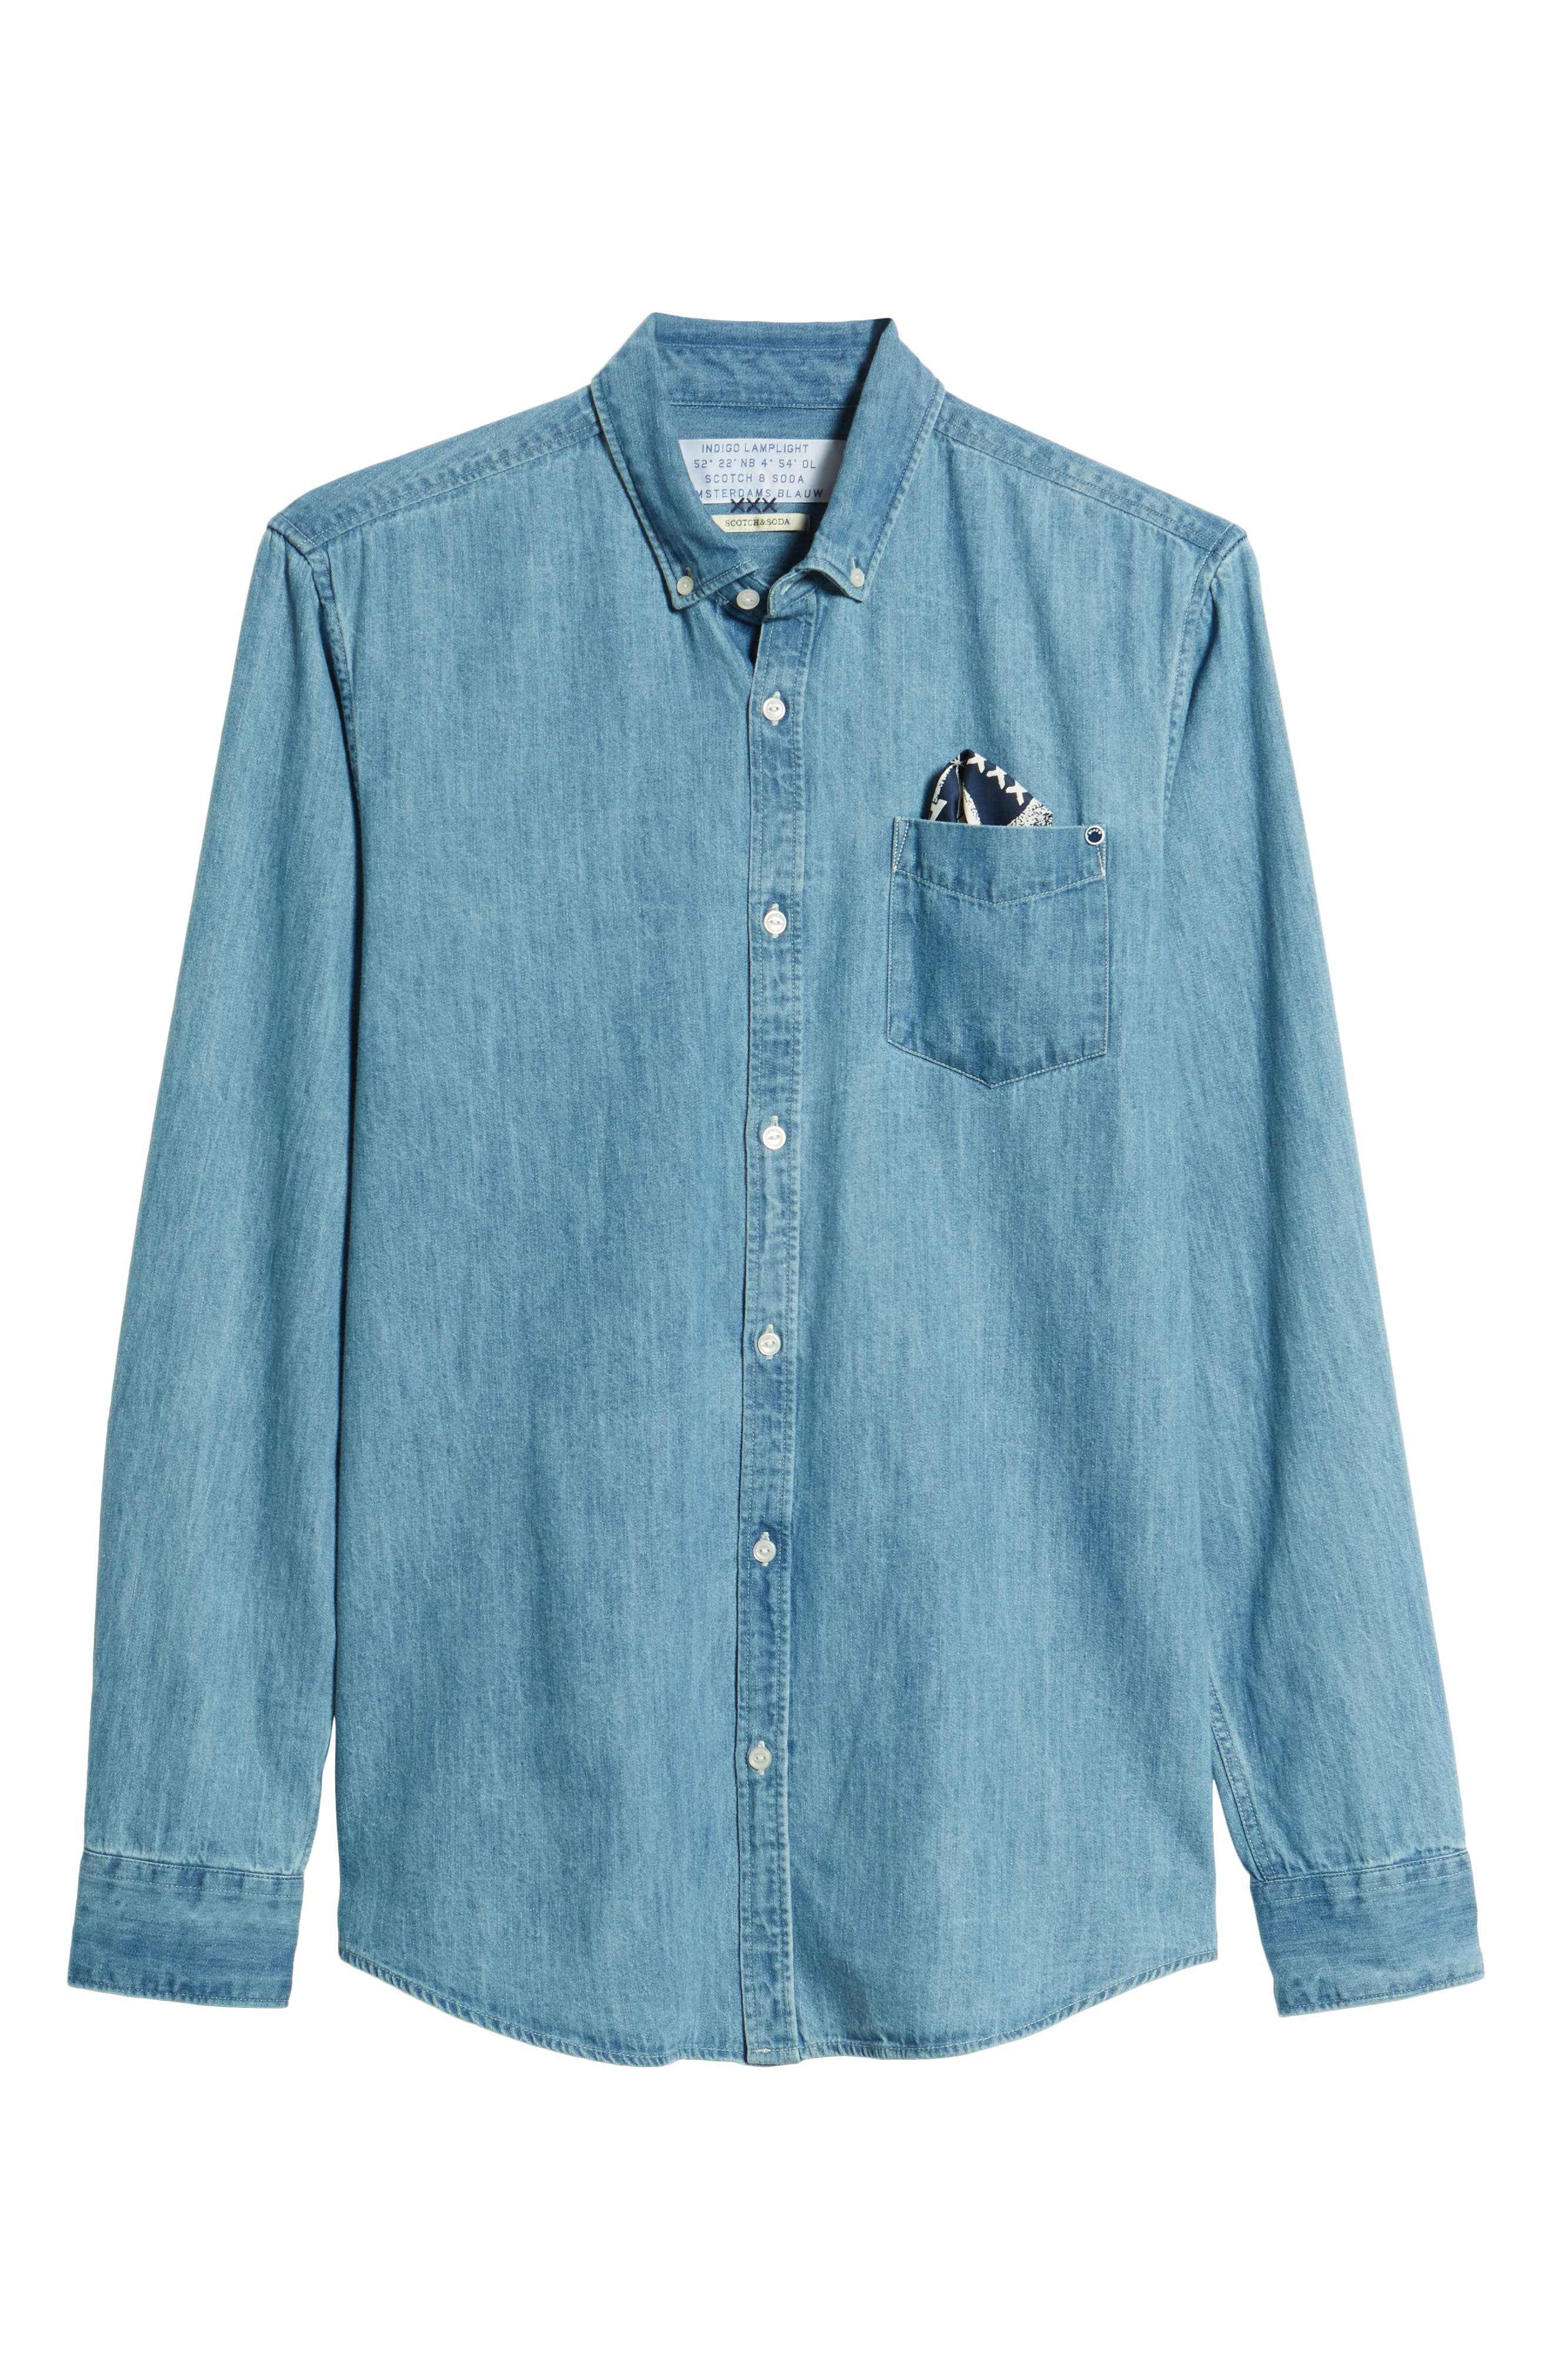 Amsterdams Blauw Pocket Square Chambray Sport Shirt,                             Alternate thumbnail 6, color,                             DENIM BLUE